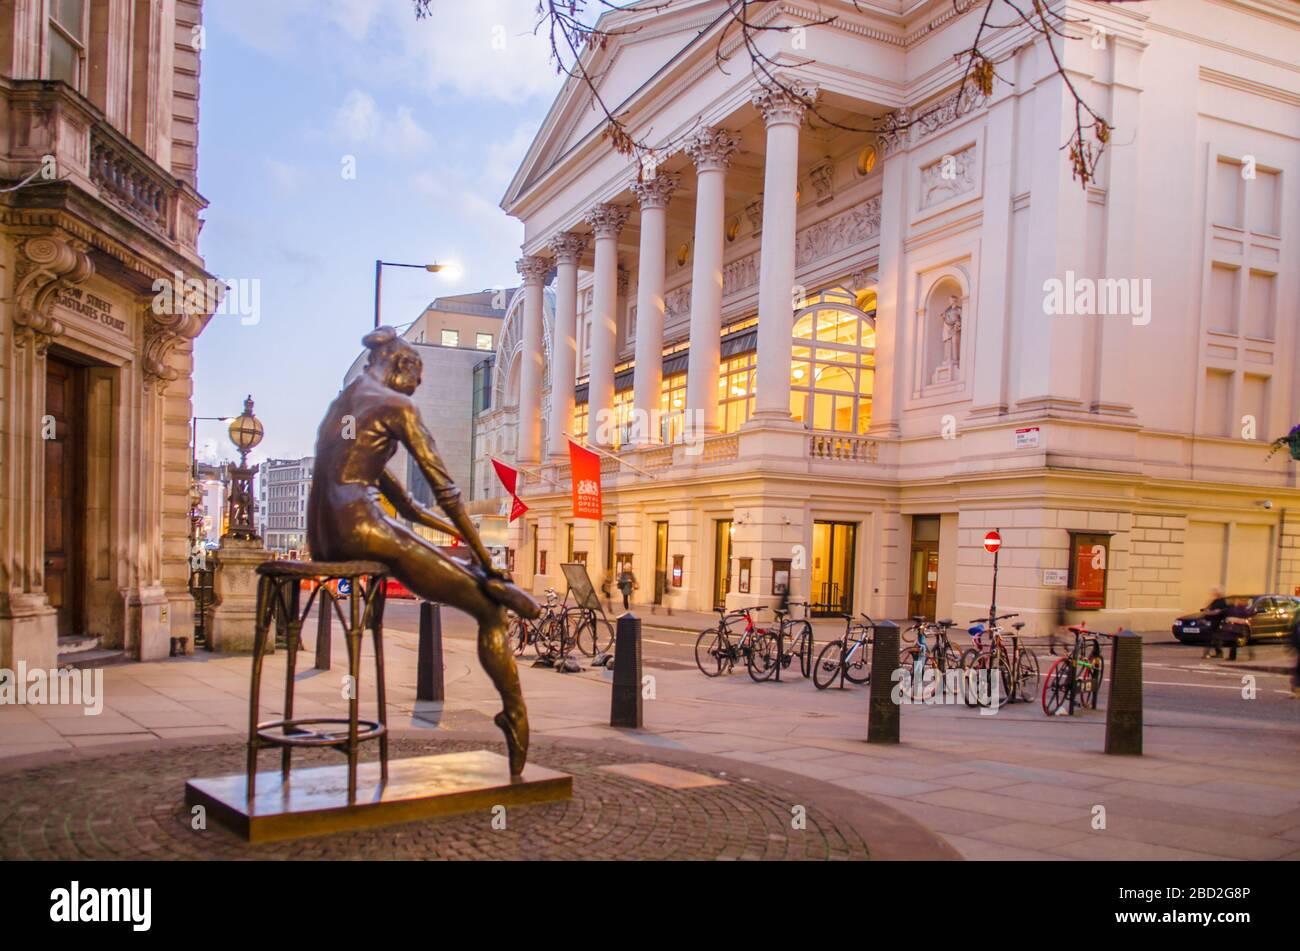 The Royal Opera House, Covent Garden, London UK Stockfoto